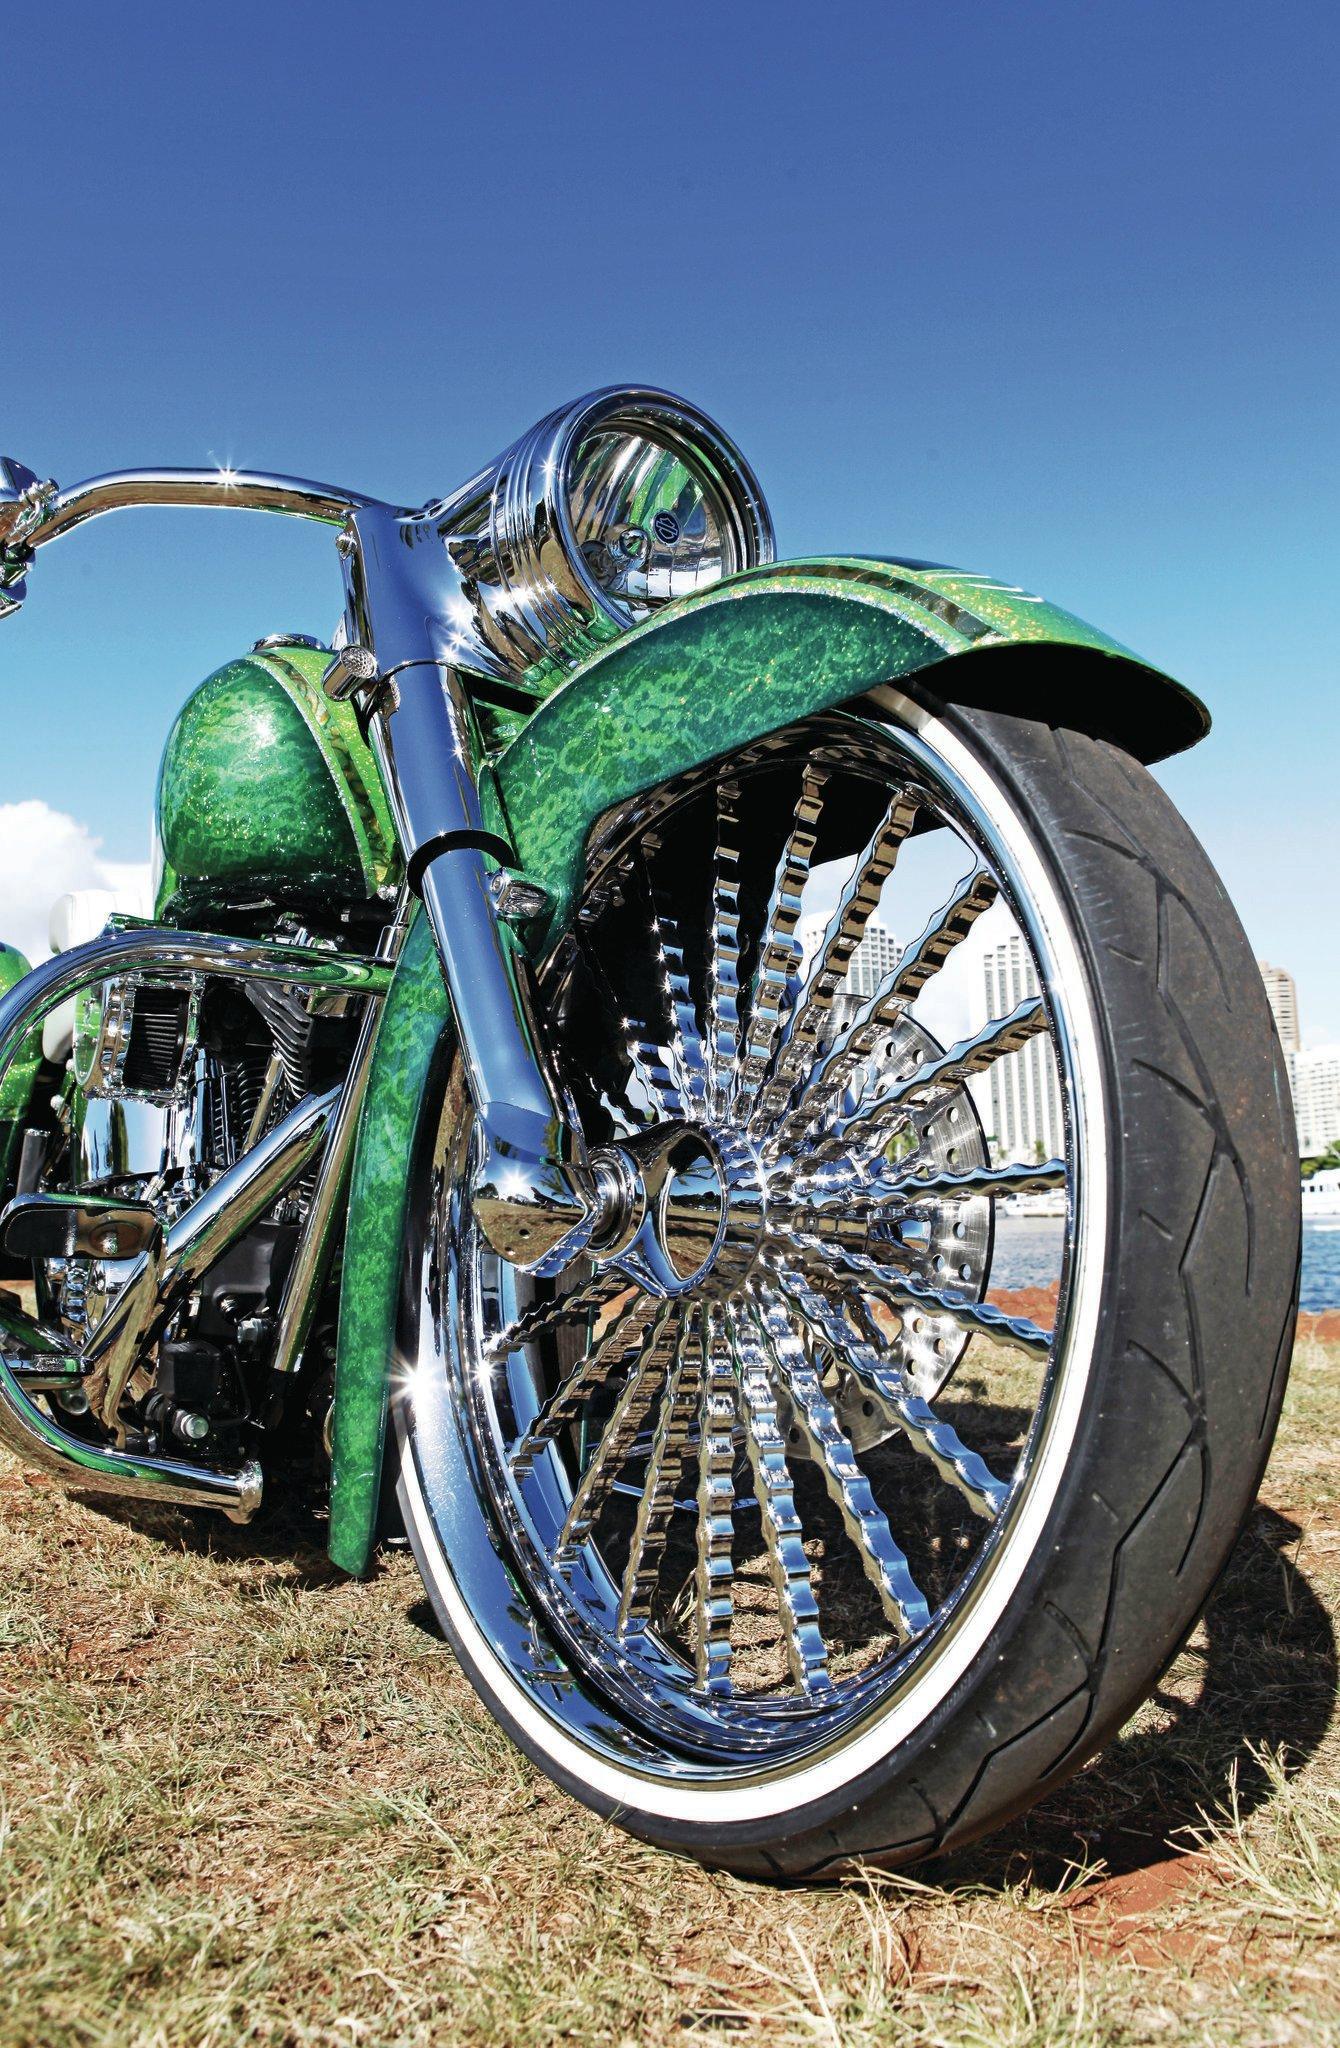 2013-harley-davidson-custom-softail-deluxe-ride-wright-front-wheel.jpg